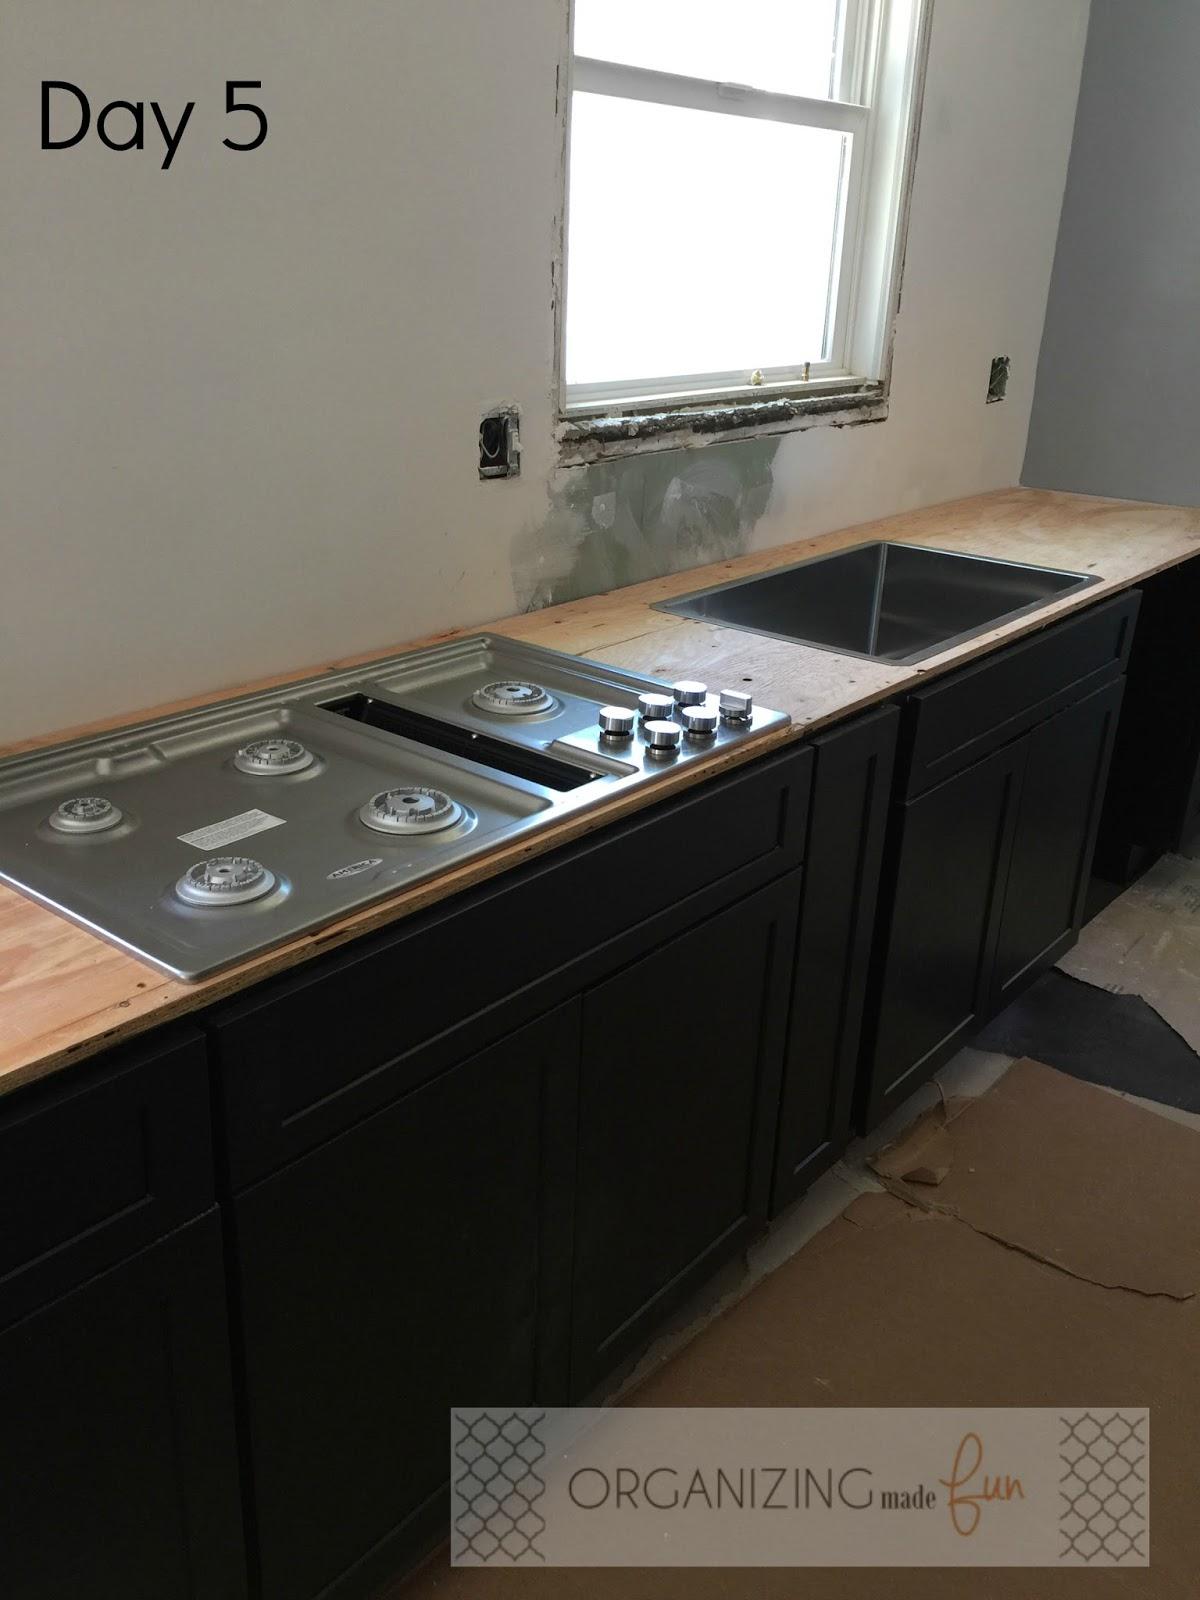 kitchen renovation almost done organizing made fun kitchen